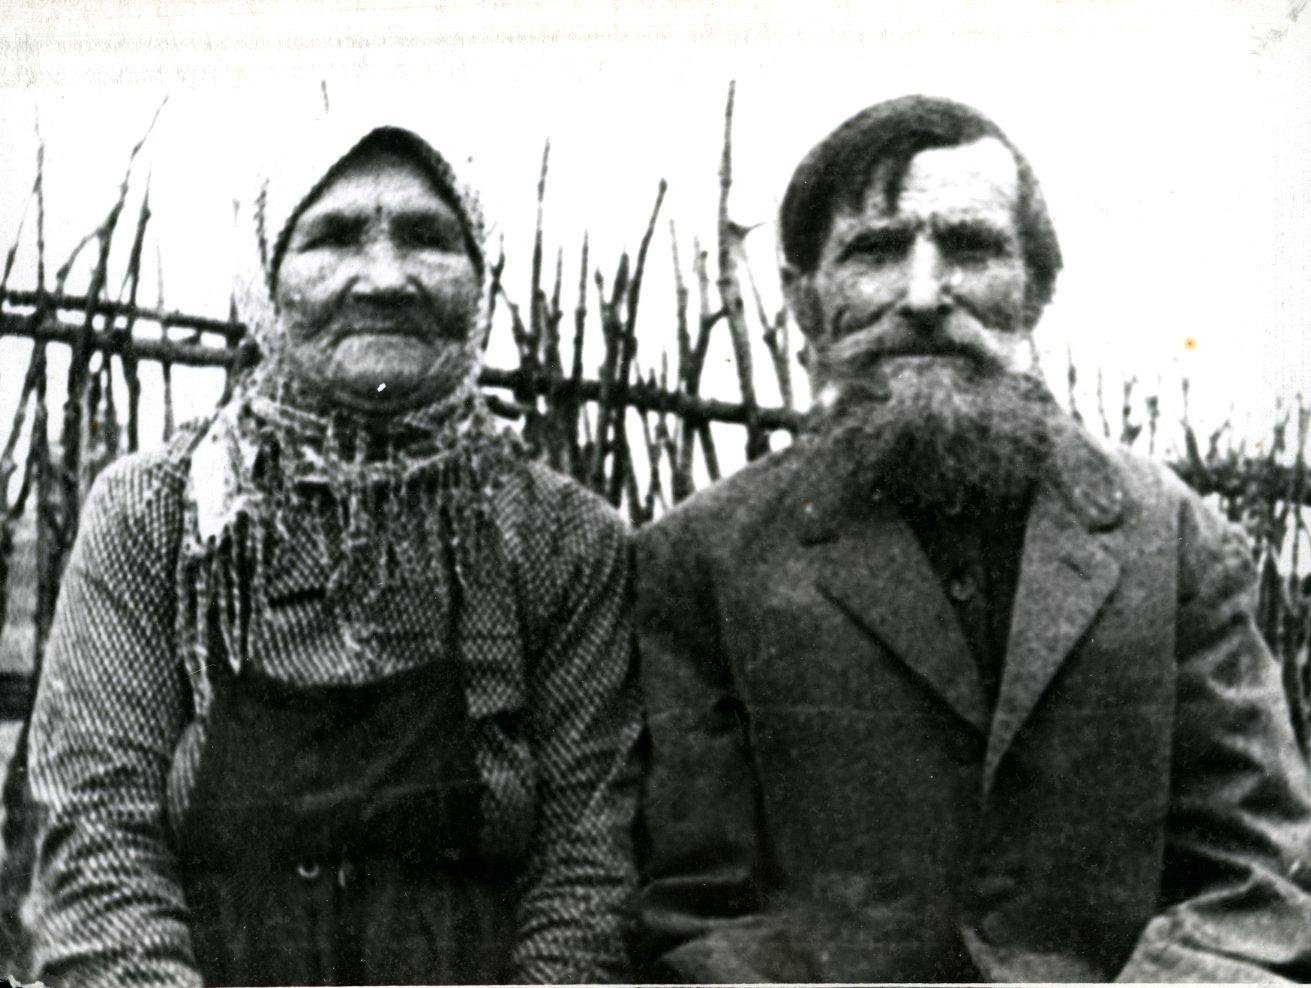 Бабушка и дедушка - нарушители паспортного режима